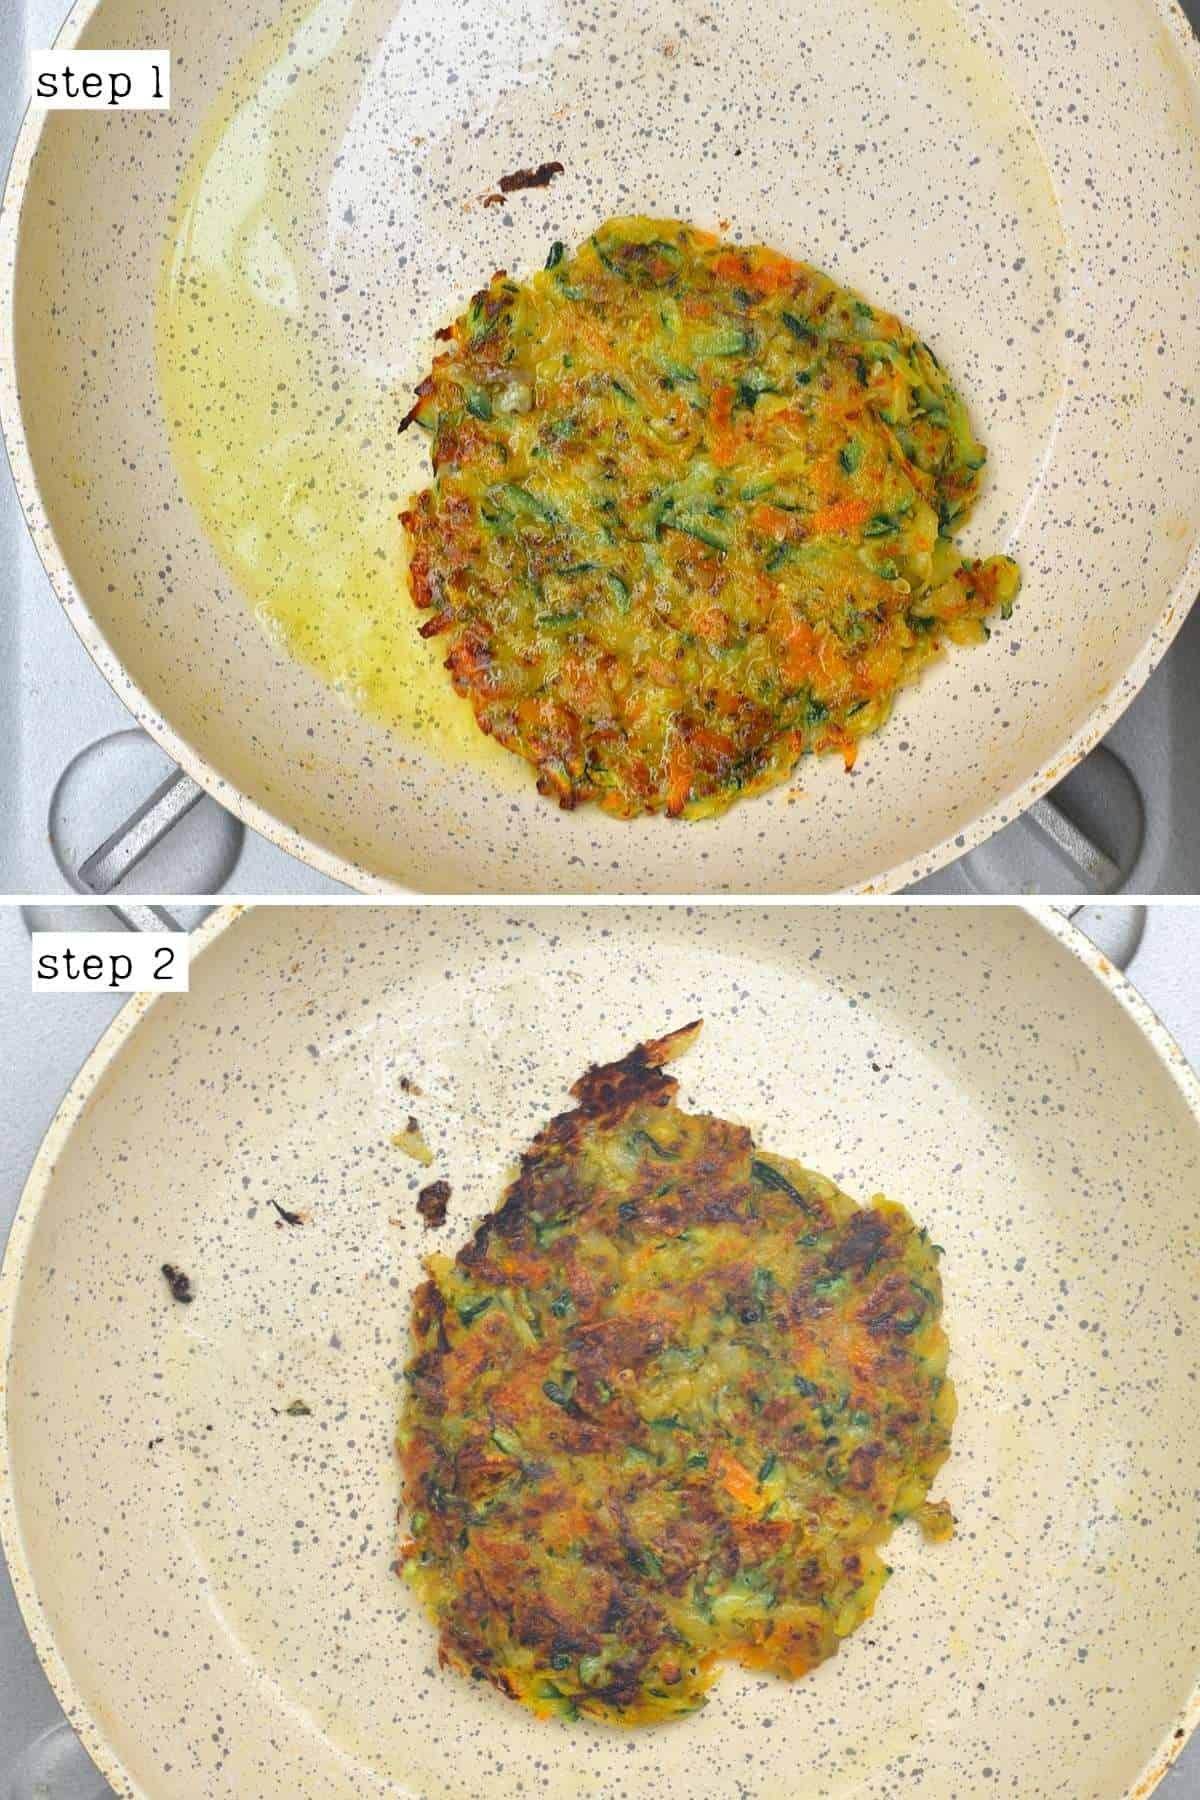 Pan-frying veggie fritter